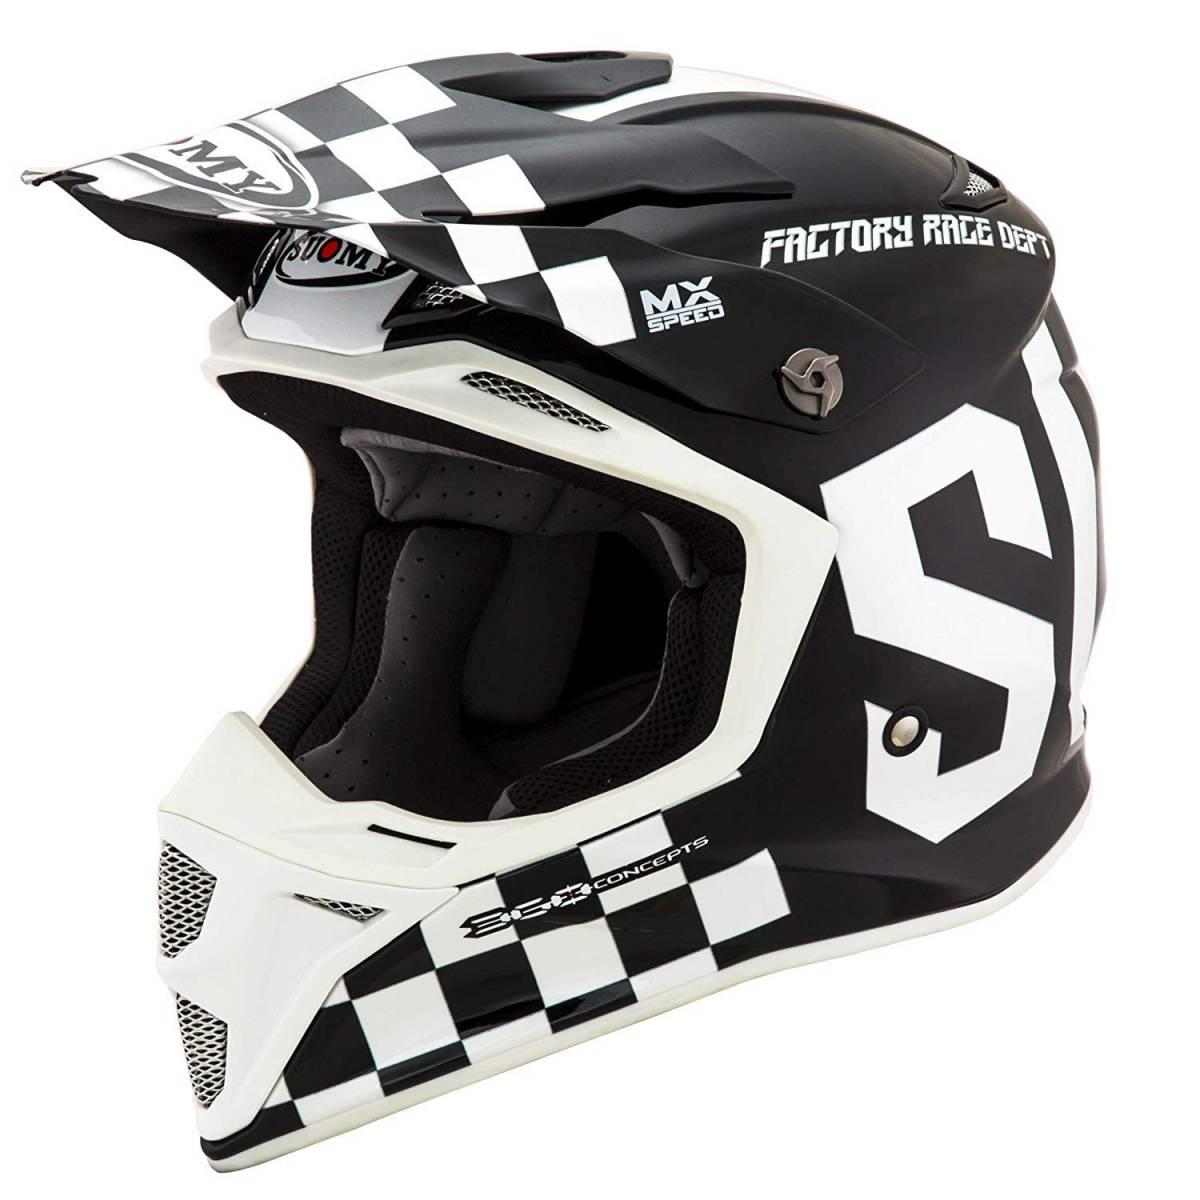 KSMS0007 - Casco Suomy Mx Speed Master Negro Blanco